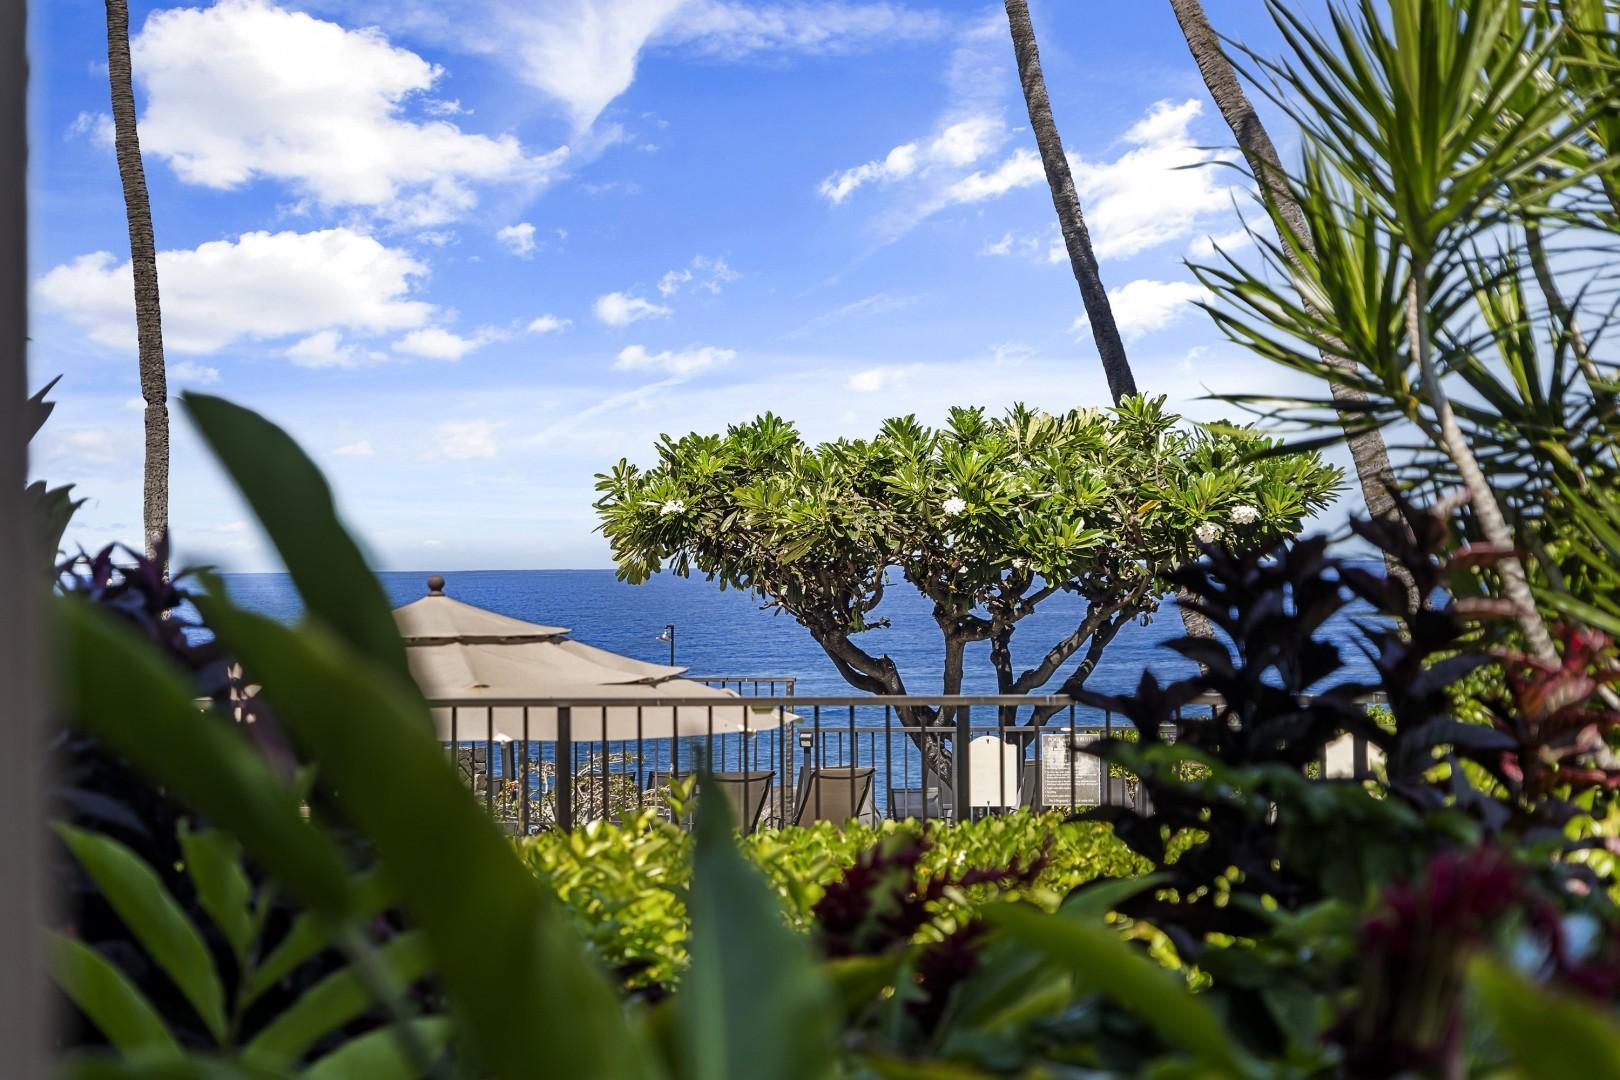 Views from the Lanai!